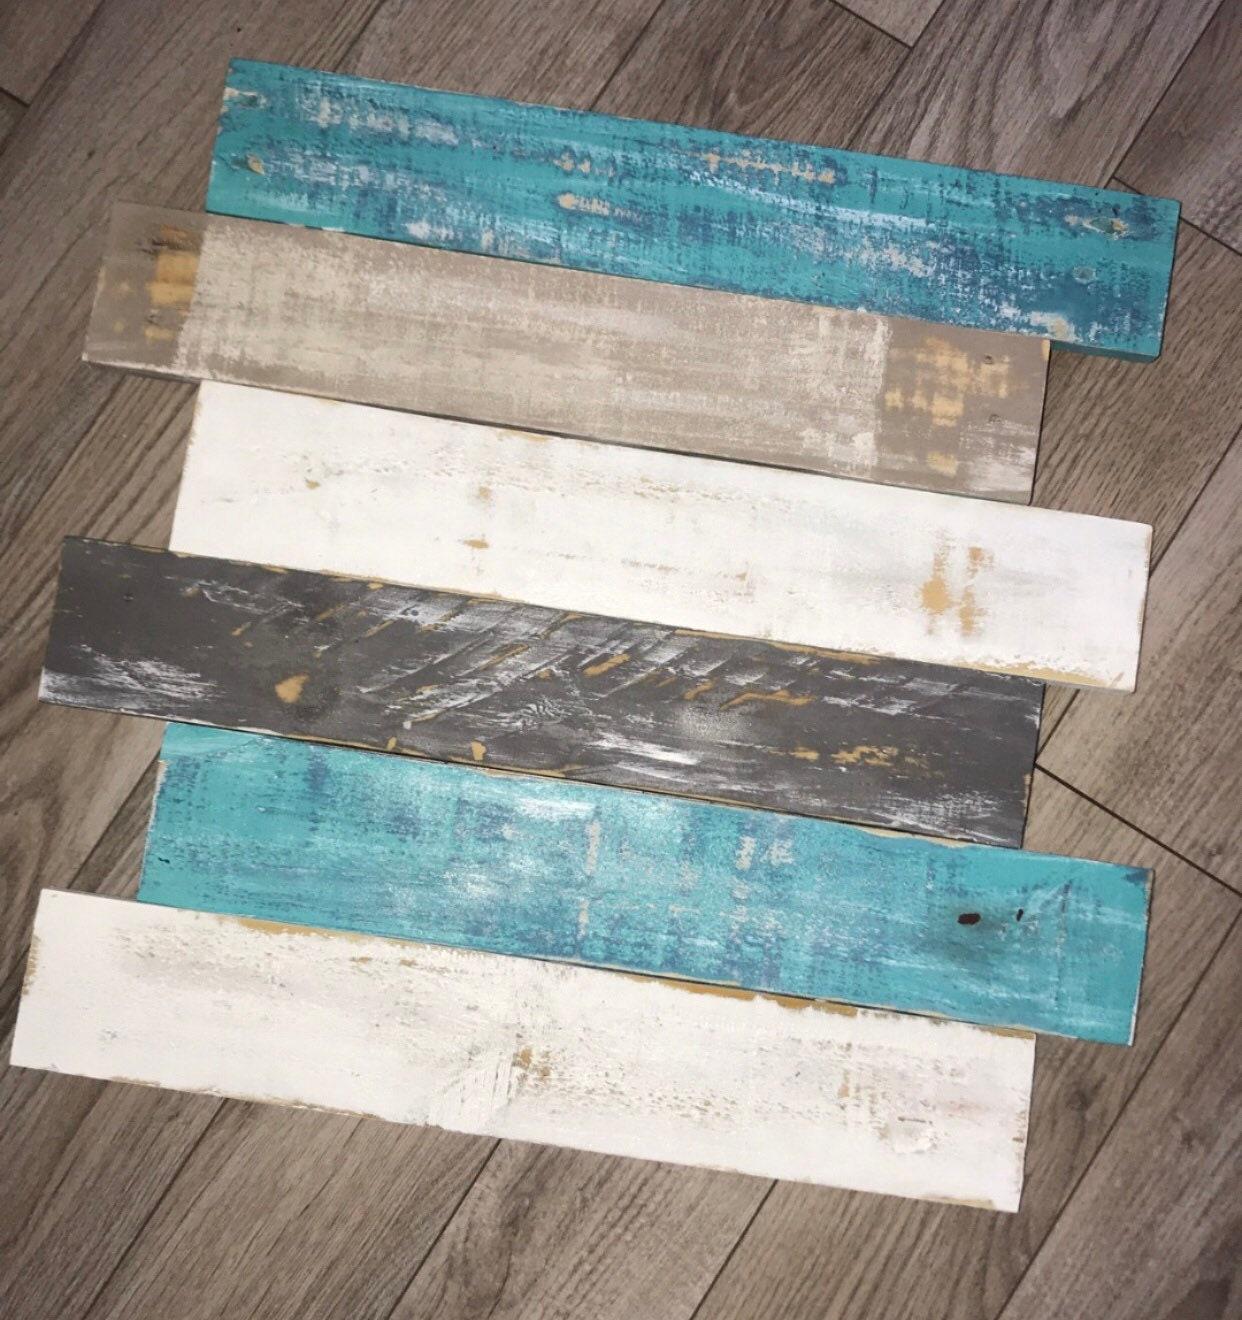 Wooden Wall Decor Wooden Pallet Pallet Decor Wall Hanging Wooden Wall Hanging